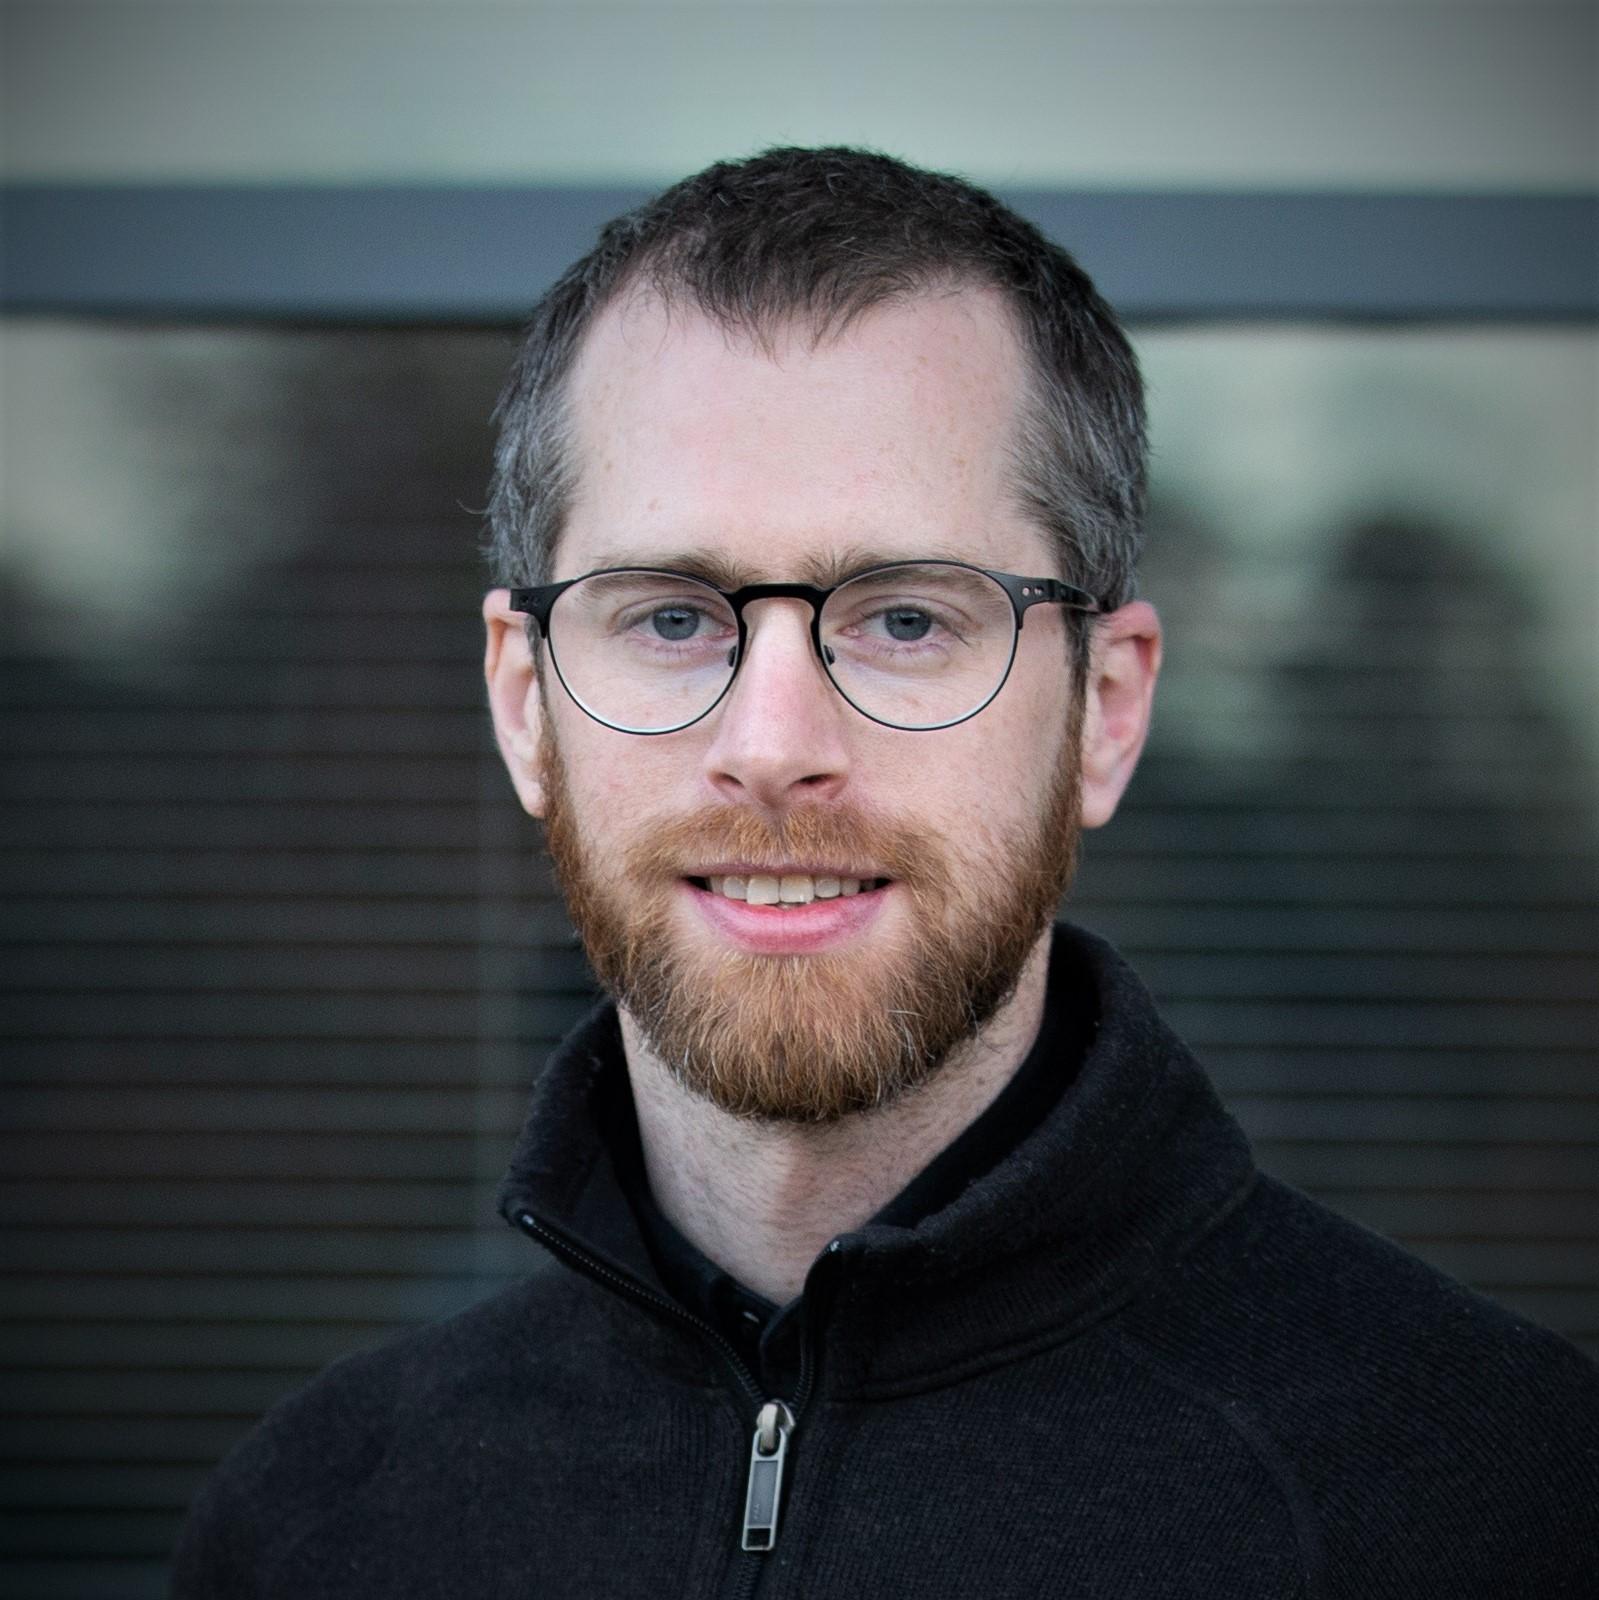 Headshot of Benedict Cross, CTO of Phoremost